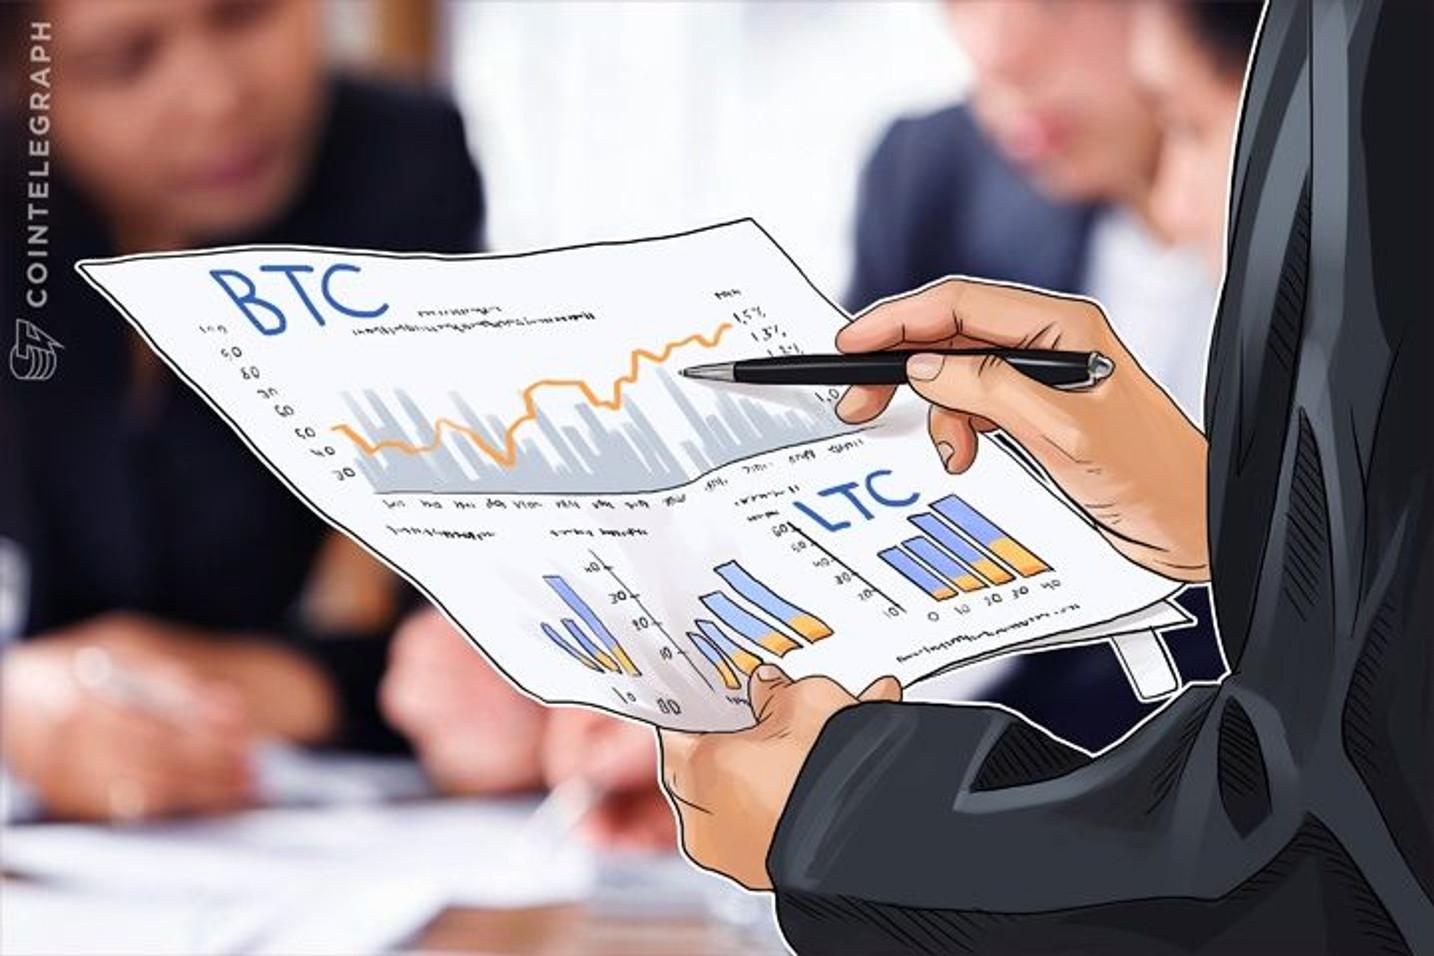 Price Analysis: BTC, ETH, ETC And LTC